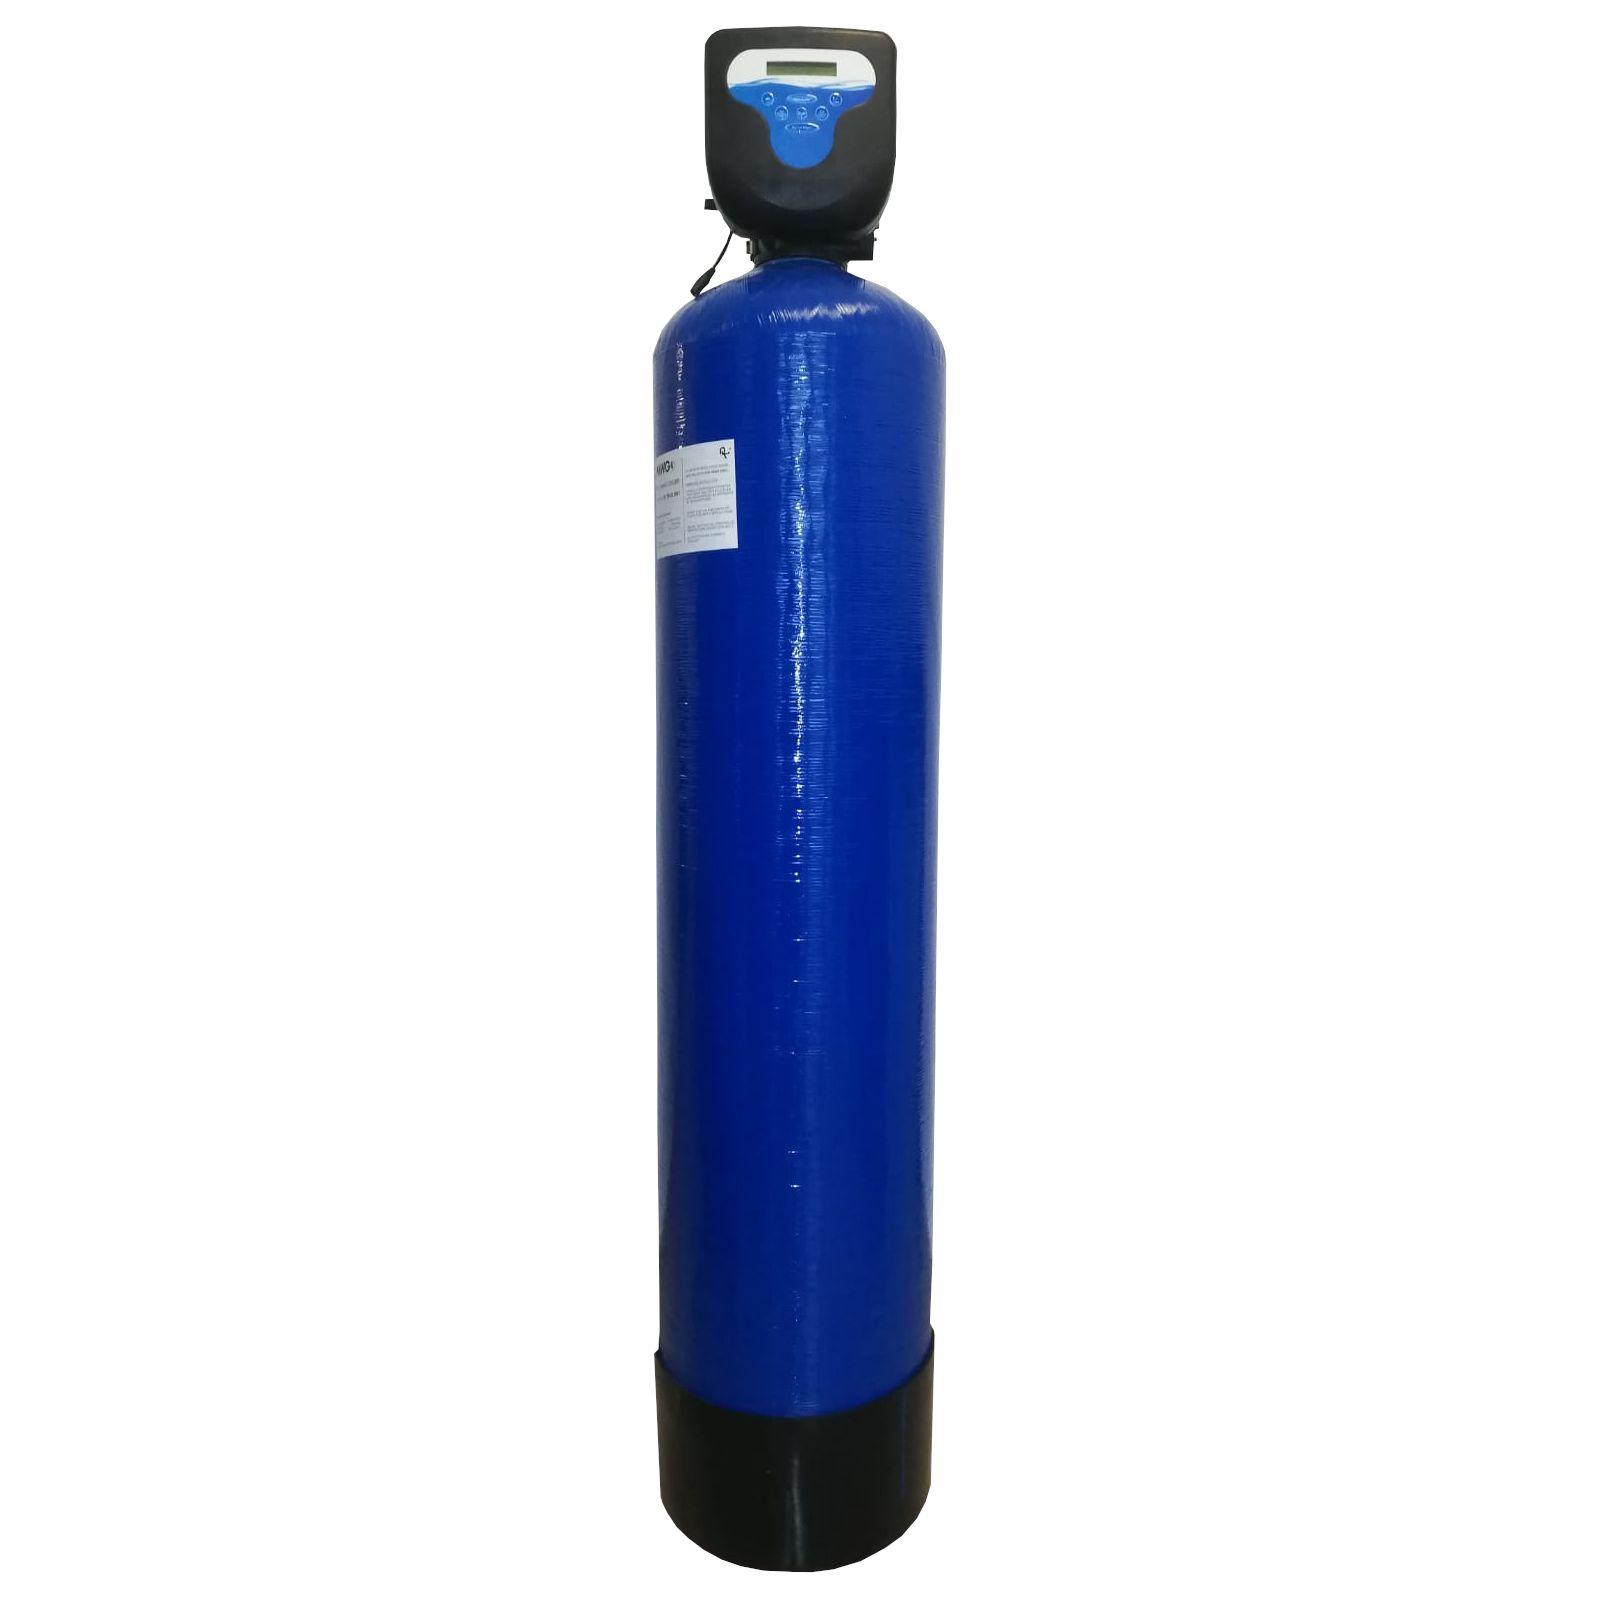 Filtru apa automat cu carbon activ Aqua AG+DM 70, Debit 1.4 mc/h, Capacitate filtrare 45.000 litri, Cartus din Carbune activ - AquaFilters.ro